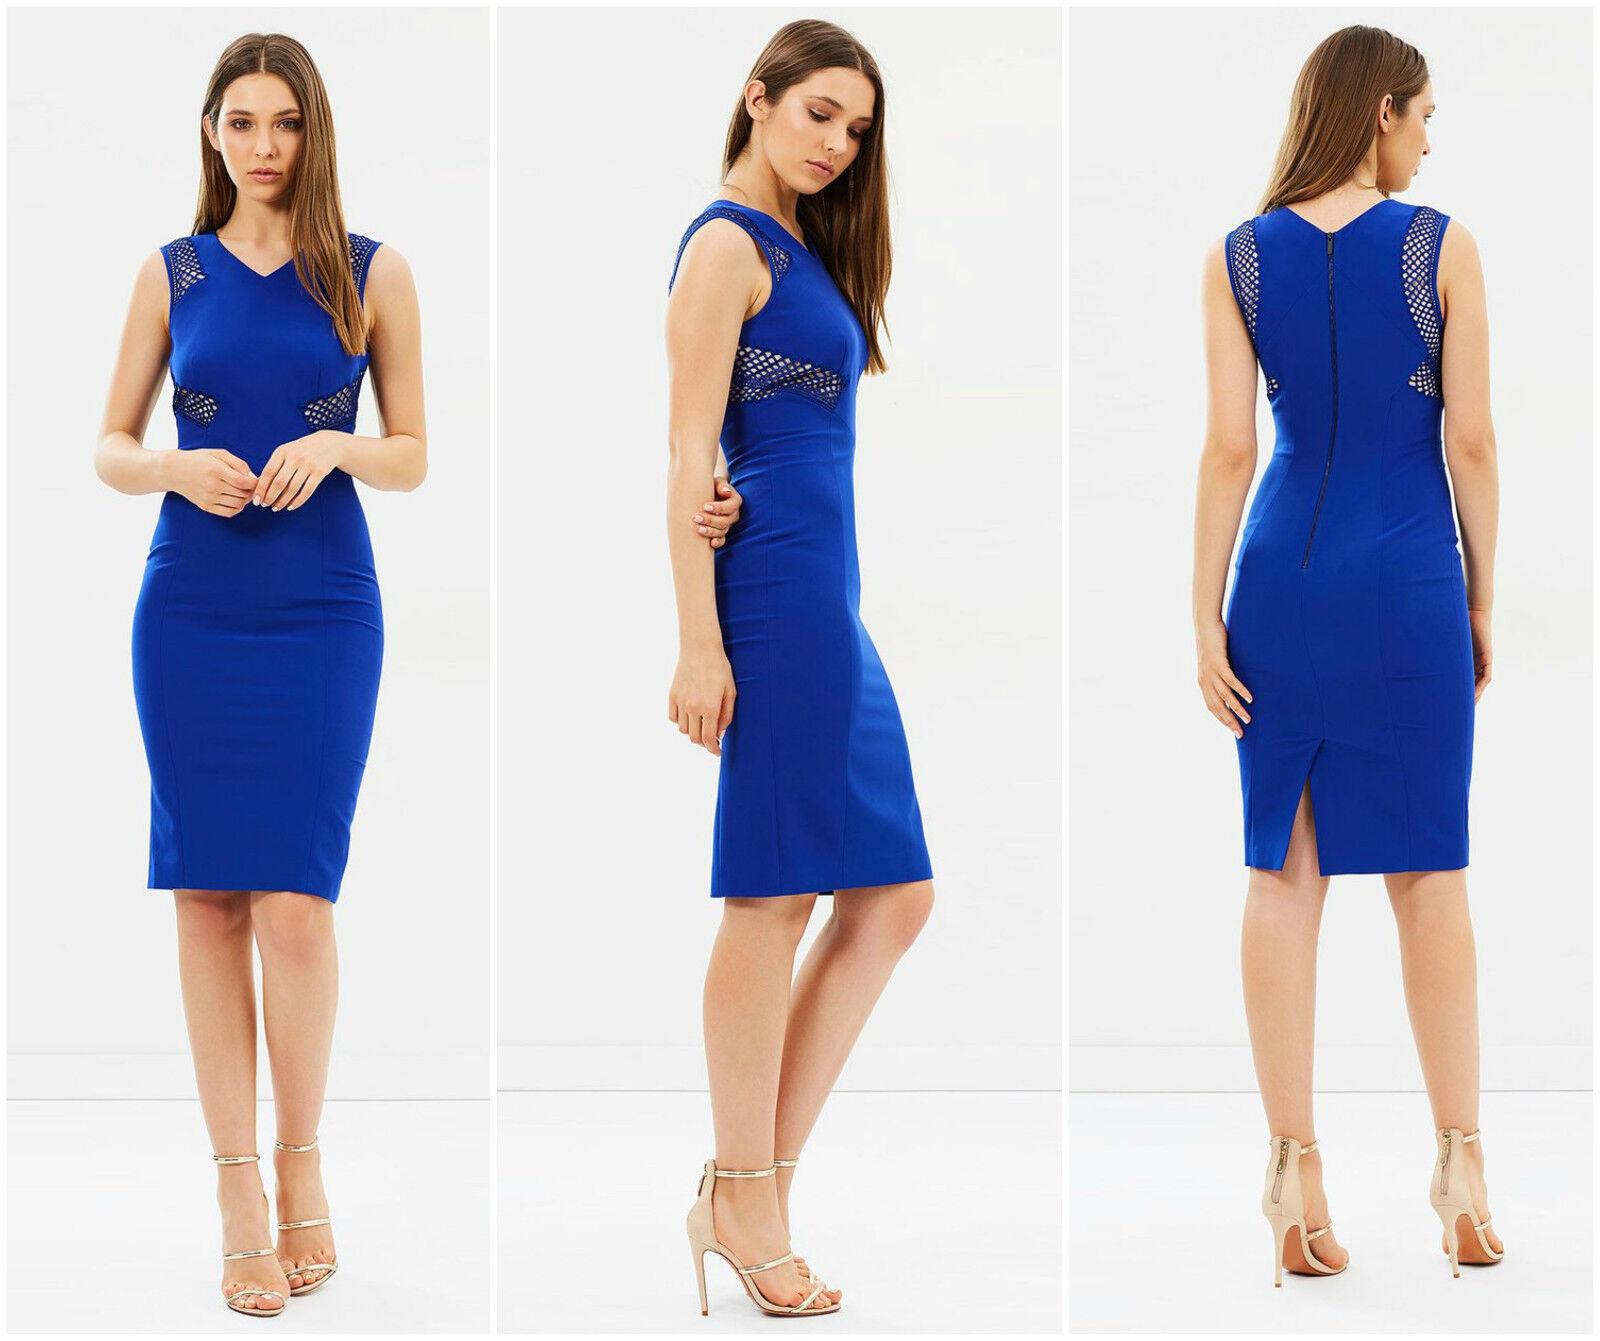 New KAREN MILLEN Blau BNWT  Lace Panel Pencil Dress UK Größe 10 12 14